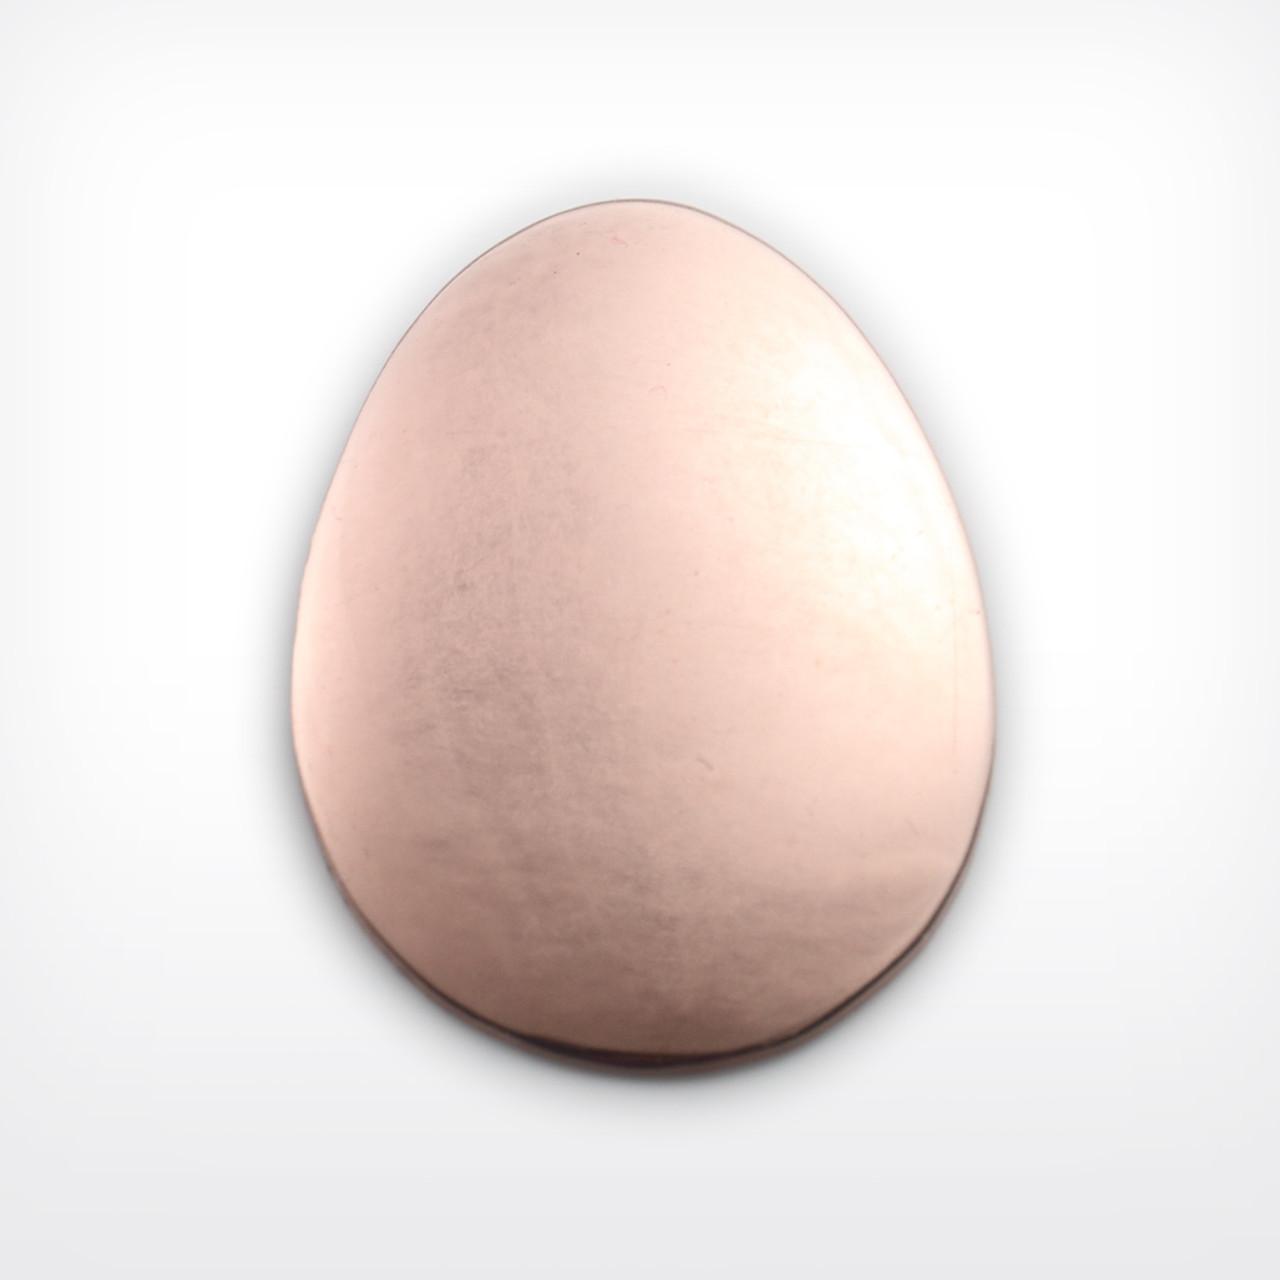 Copper Blank Egg Stamped Shape for Enamelling & Other Crafts